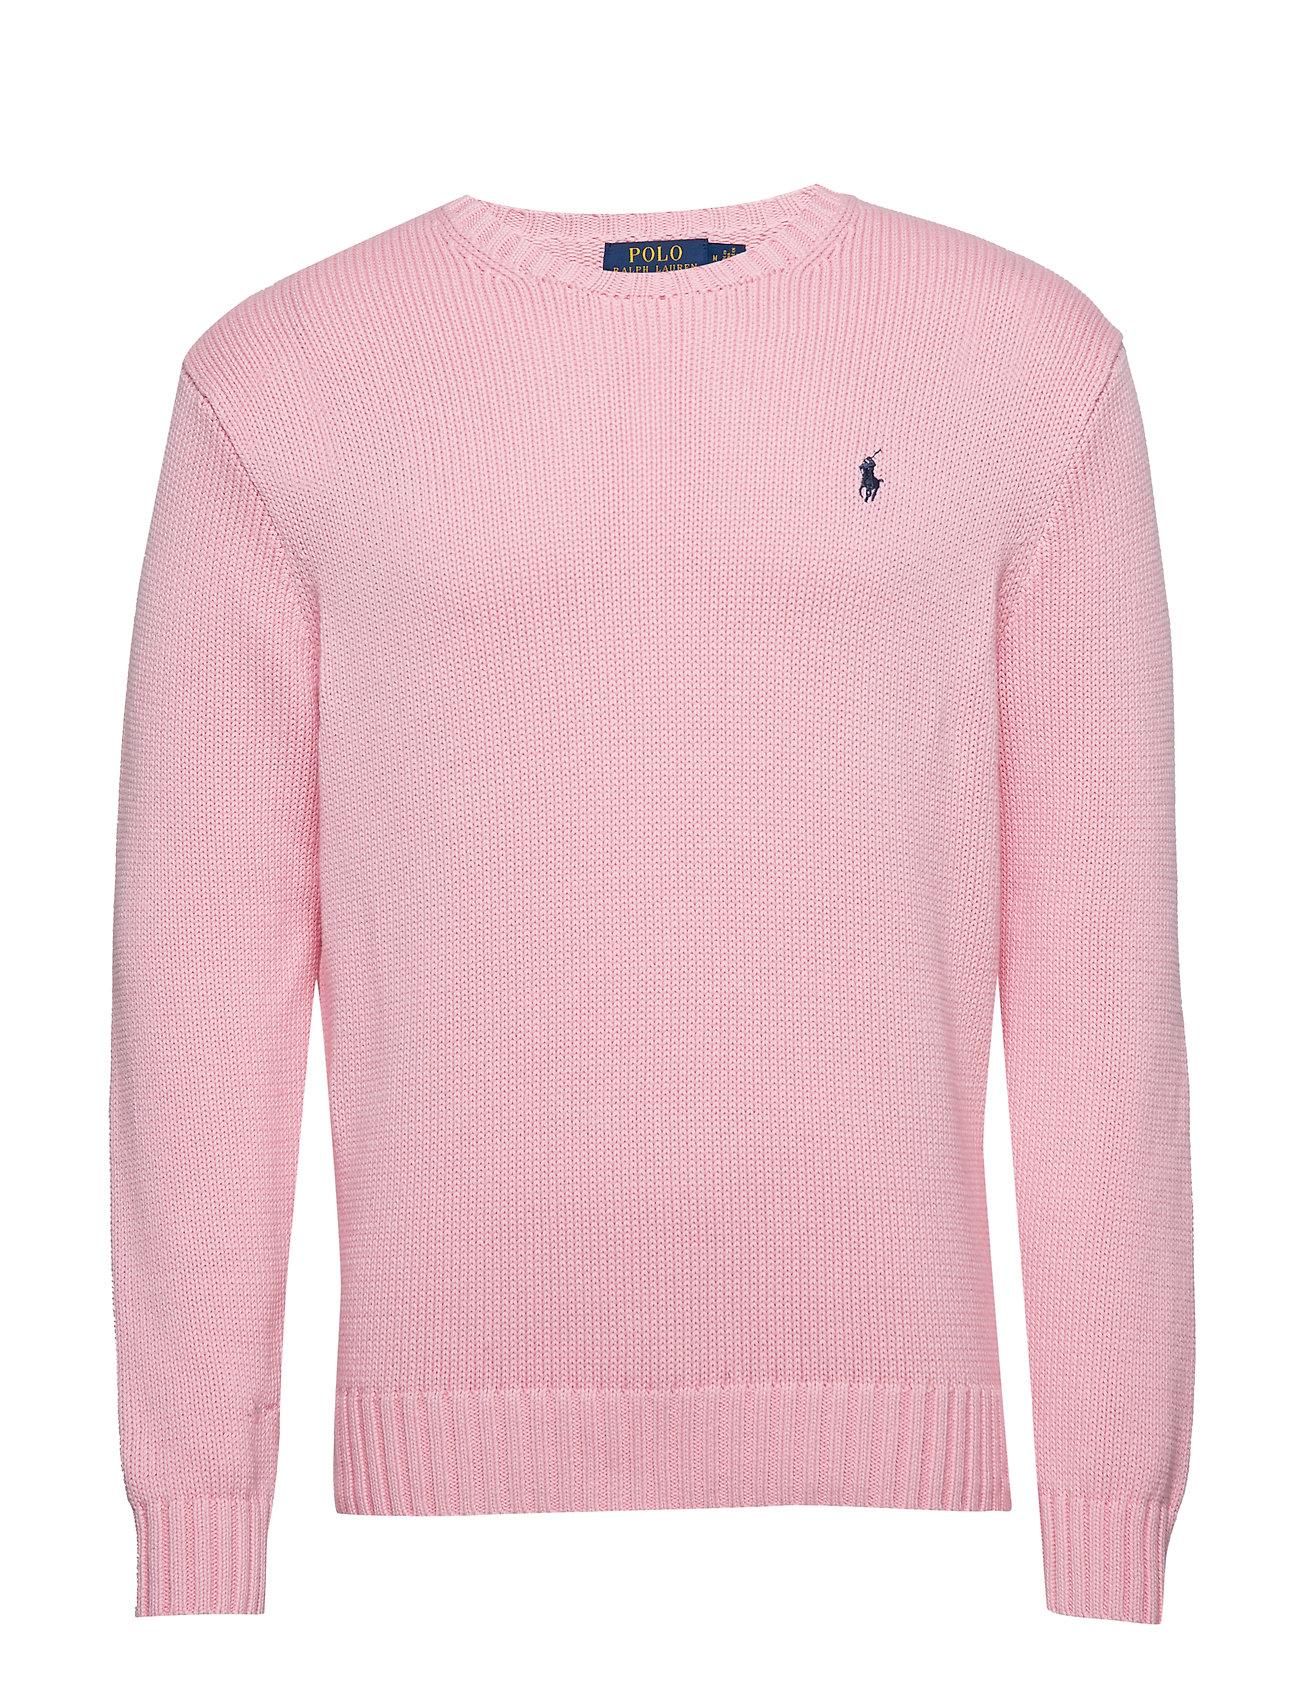 6c5c0ba0a78a Ls Cn Pp-long Sleeve-sweater (Miami Pink) (£109) - Polo Ralph Lauren ...